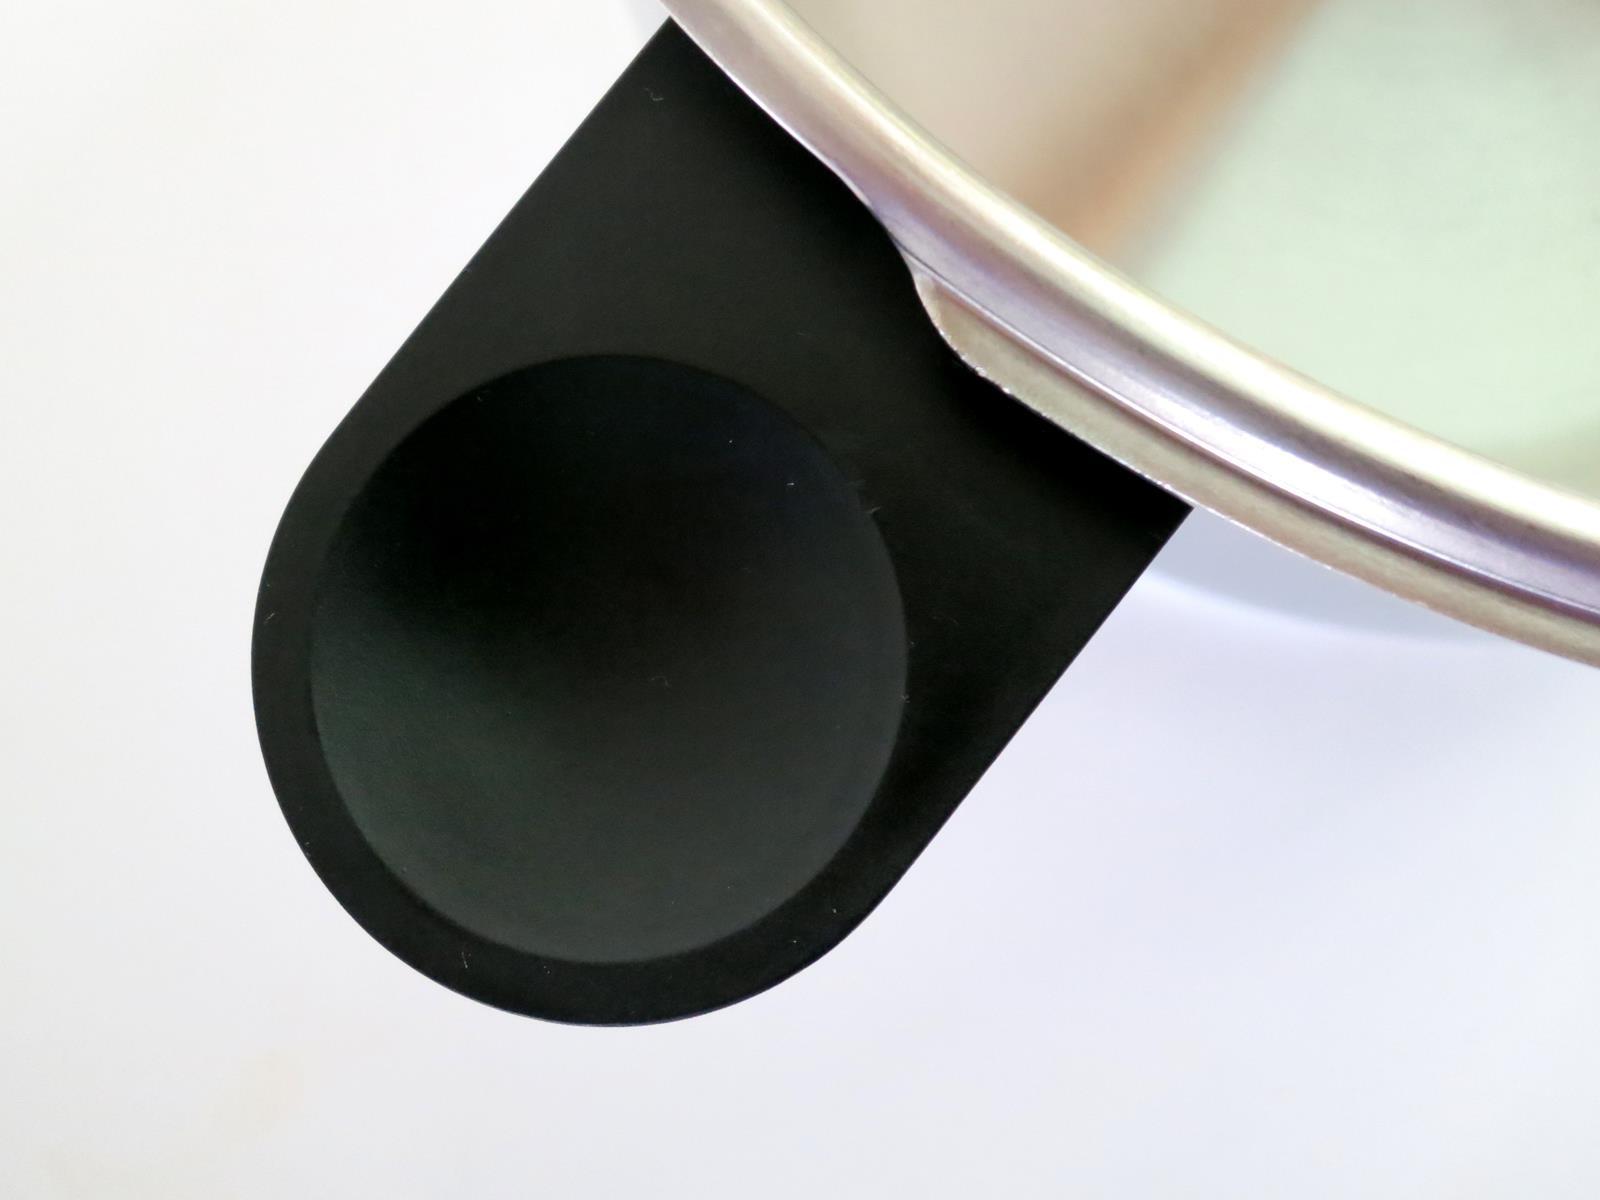 extra-small handles